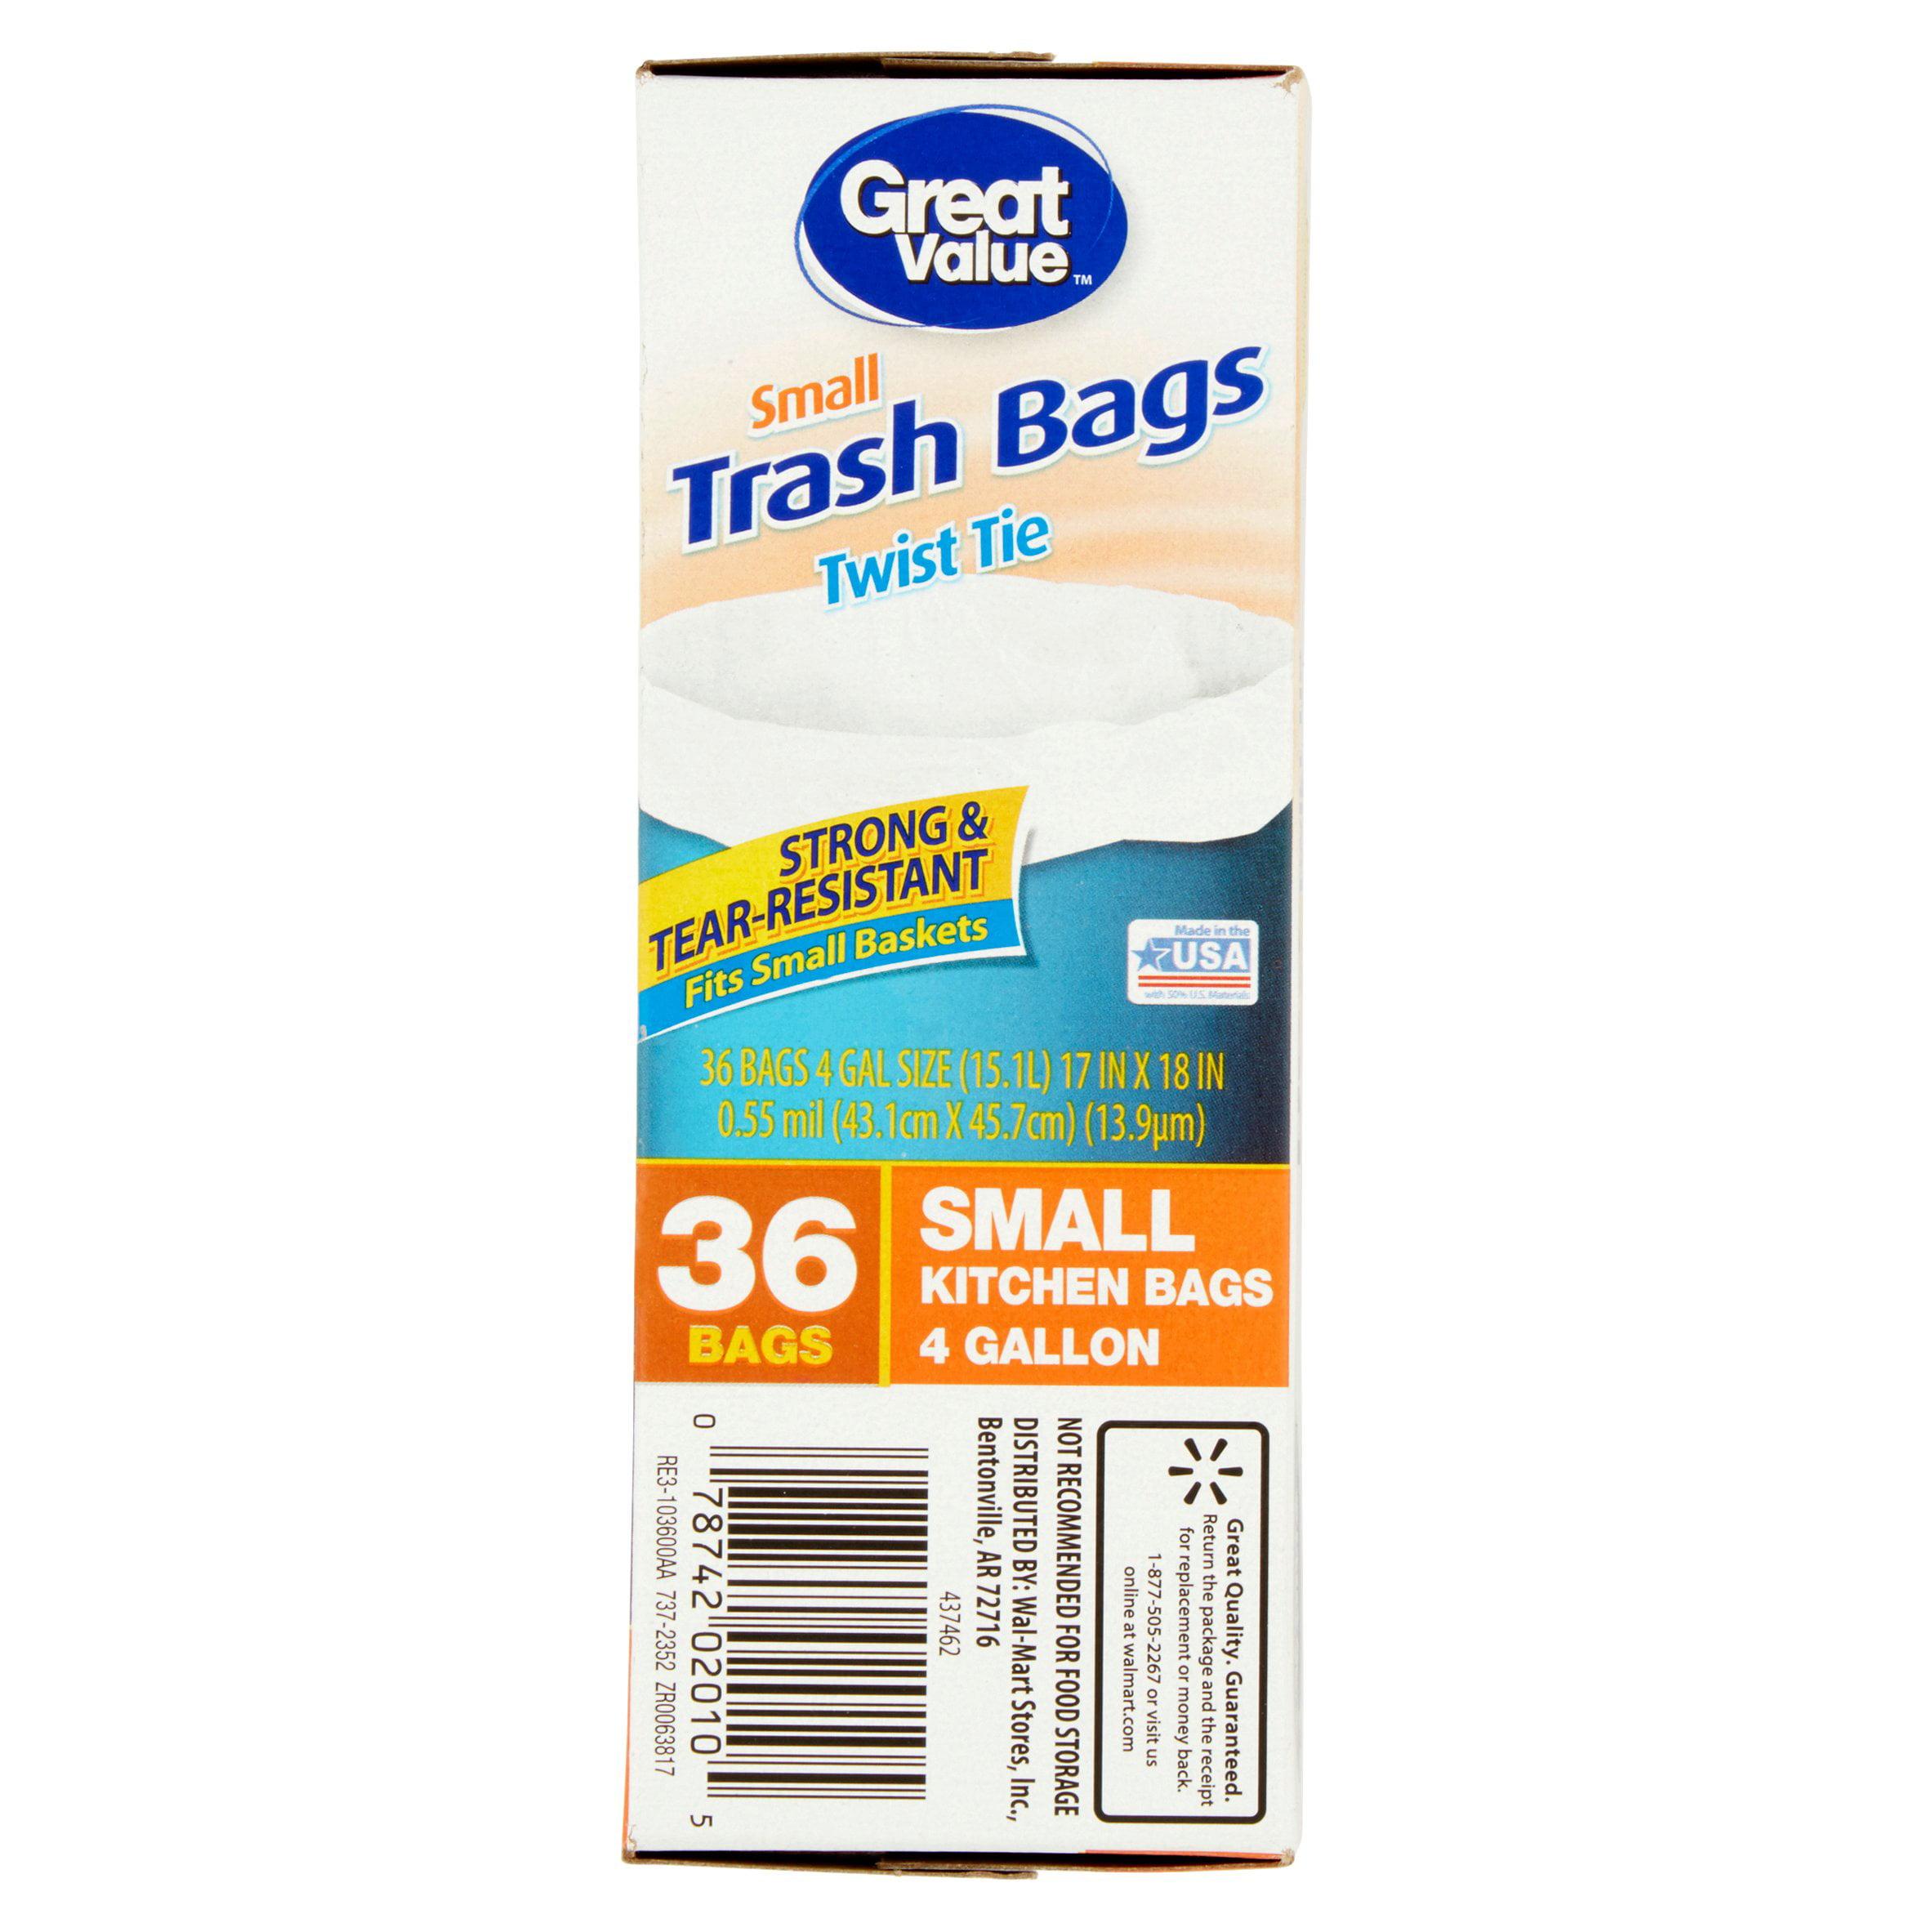 Great Value Twist Tie Small Kitchen Bags 4 Gallon 36 Ct